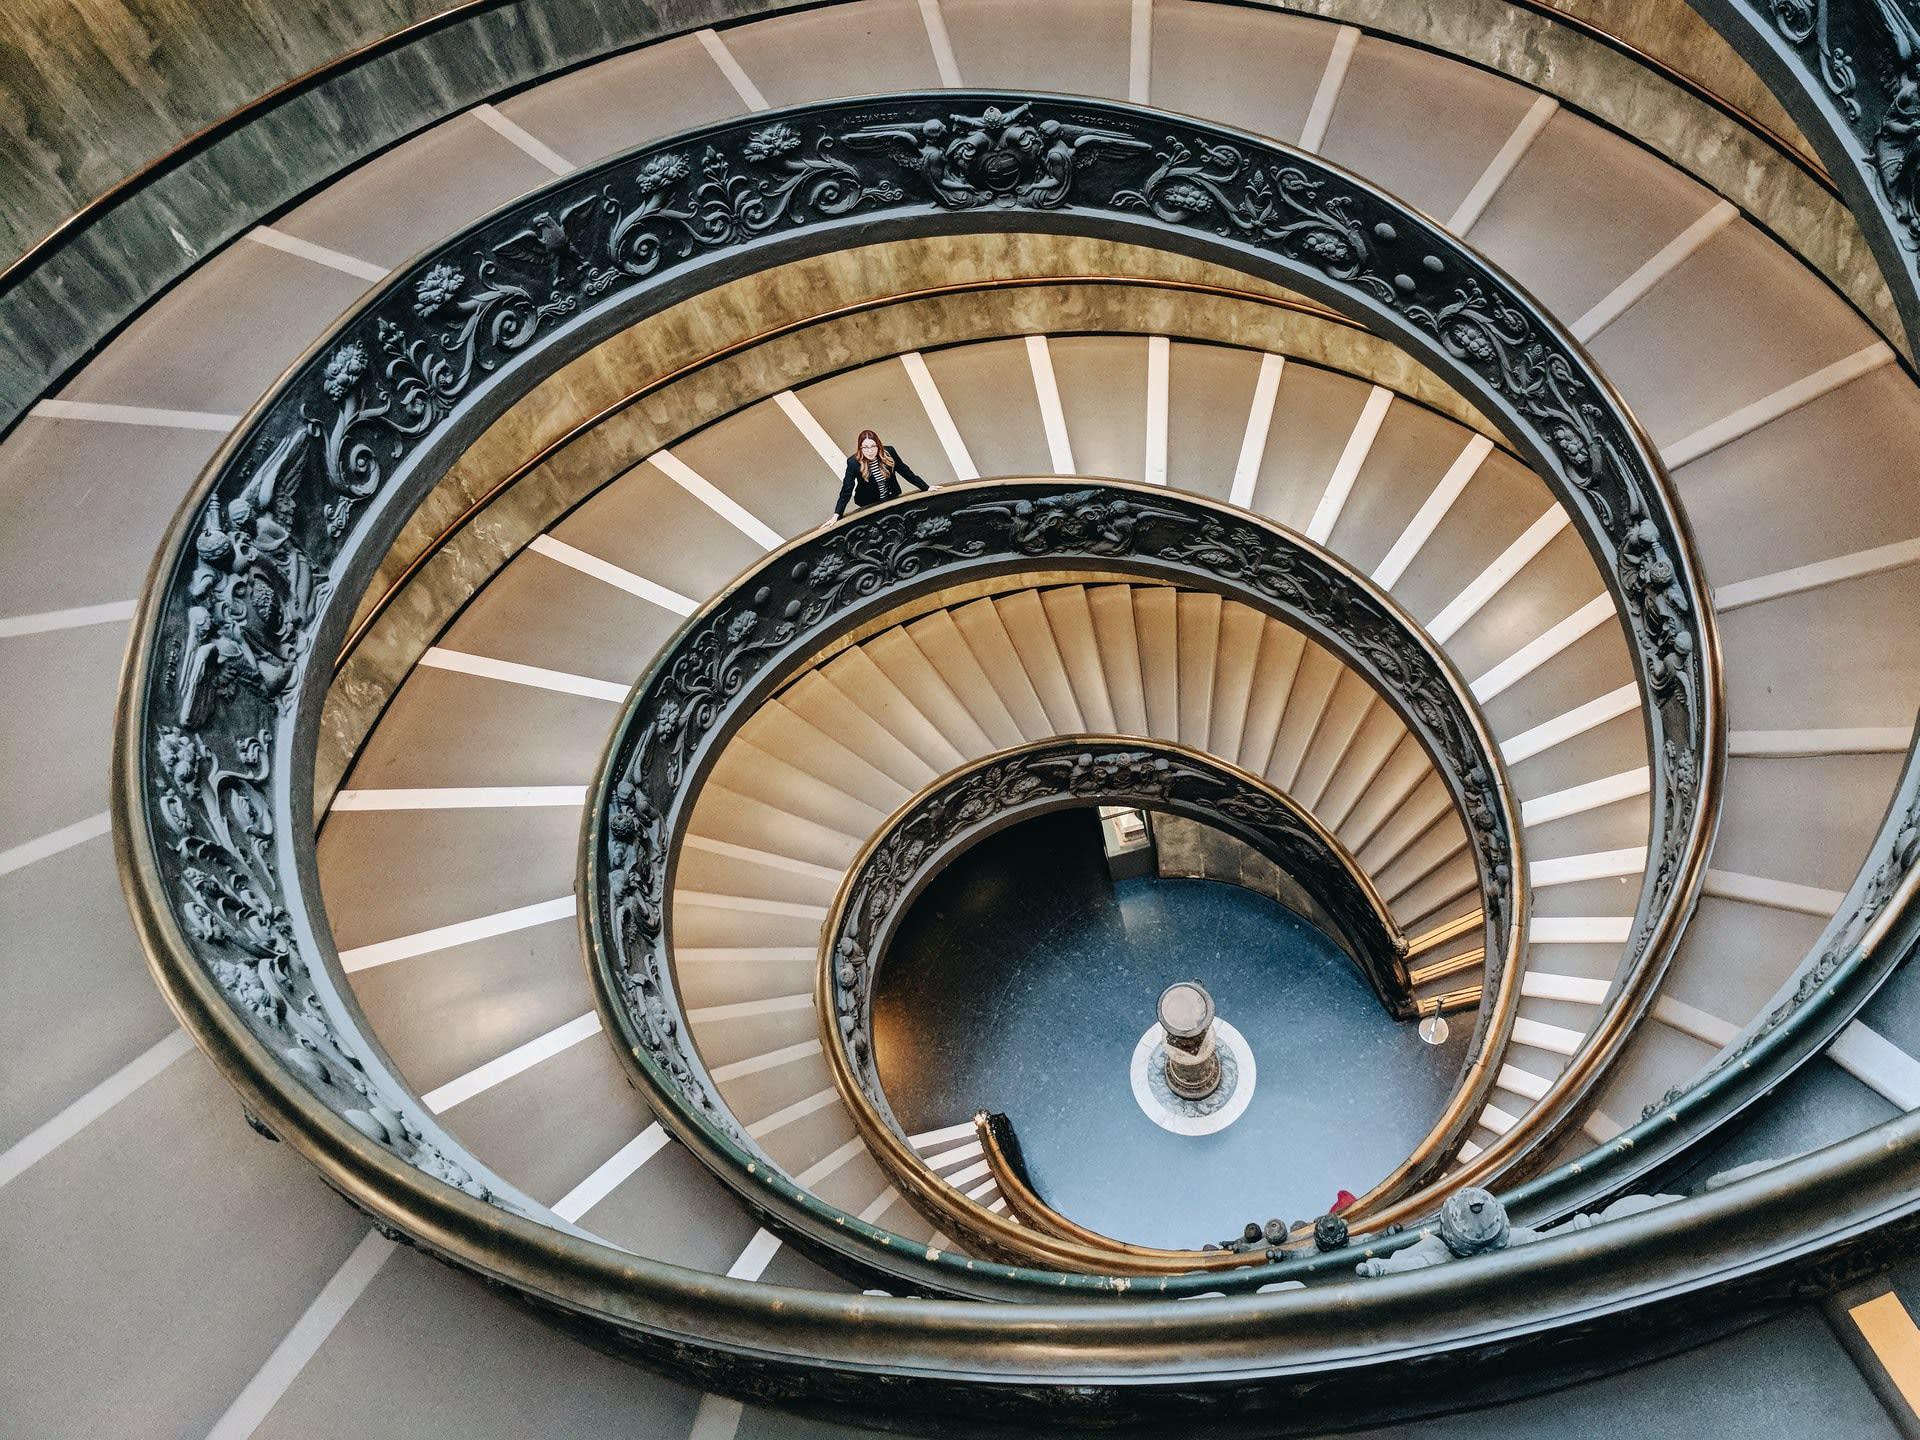 Çevrimiçi Rulet: Fibonacci Ruleti Kazanma Stratejisi